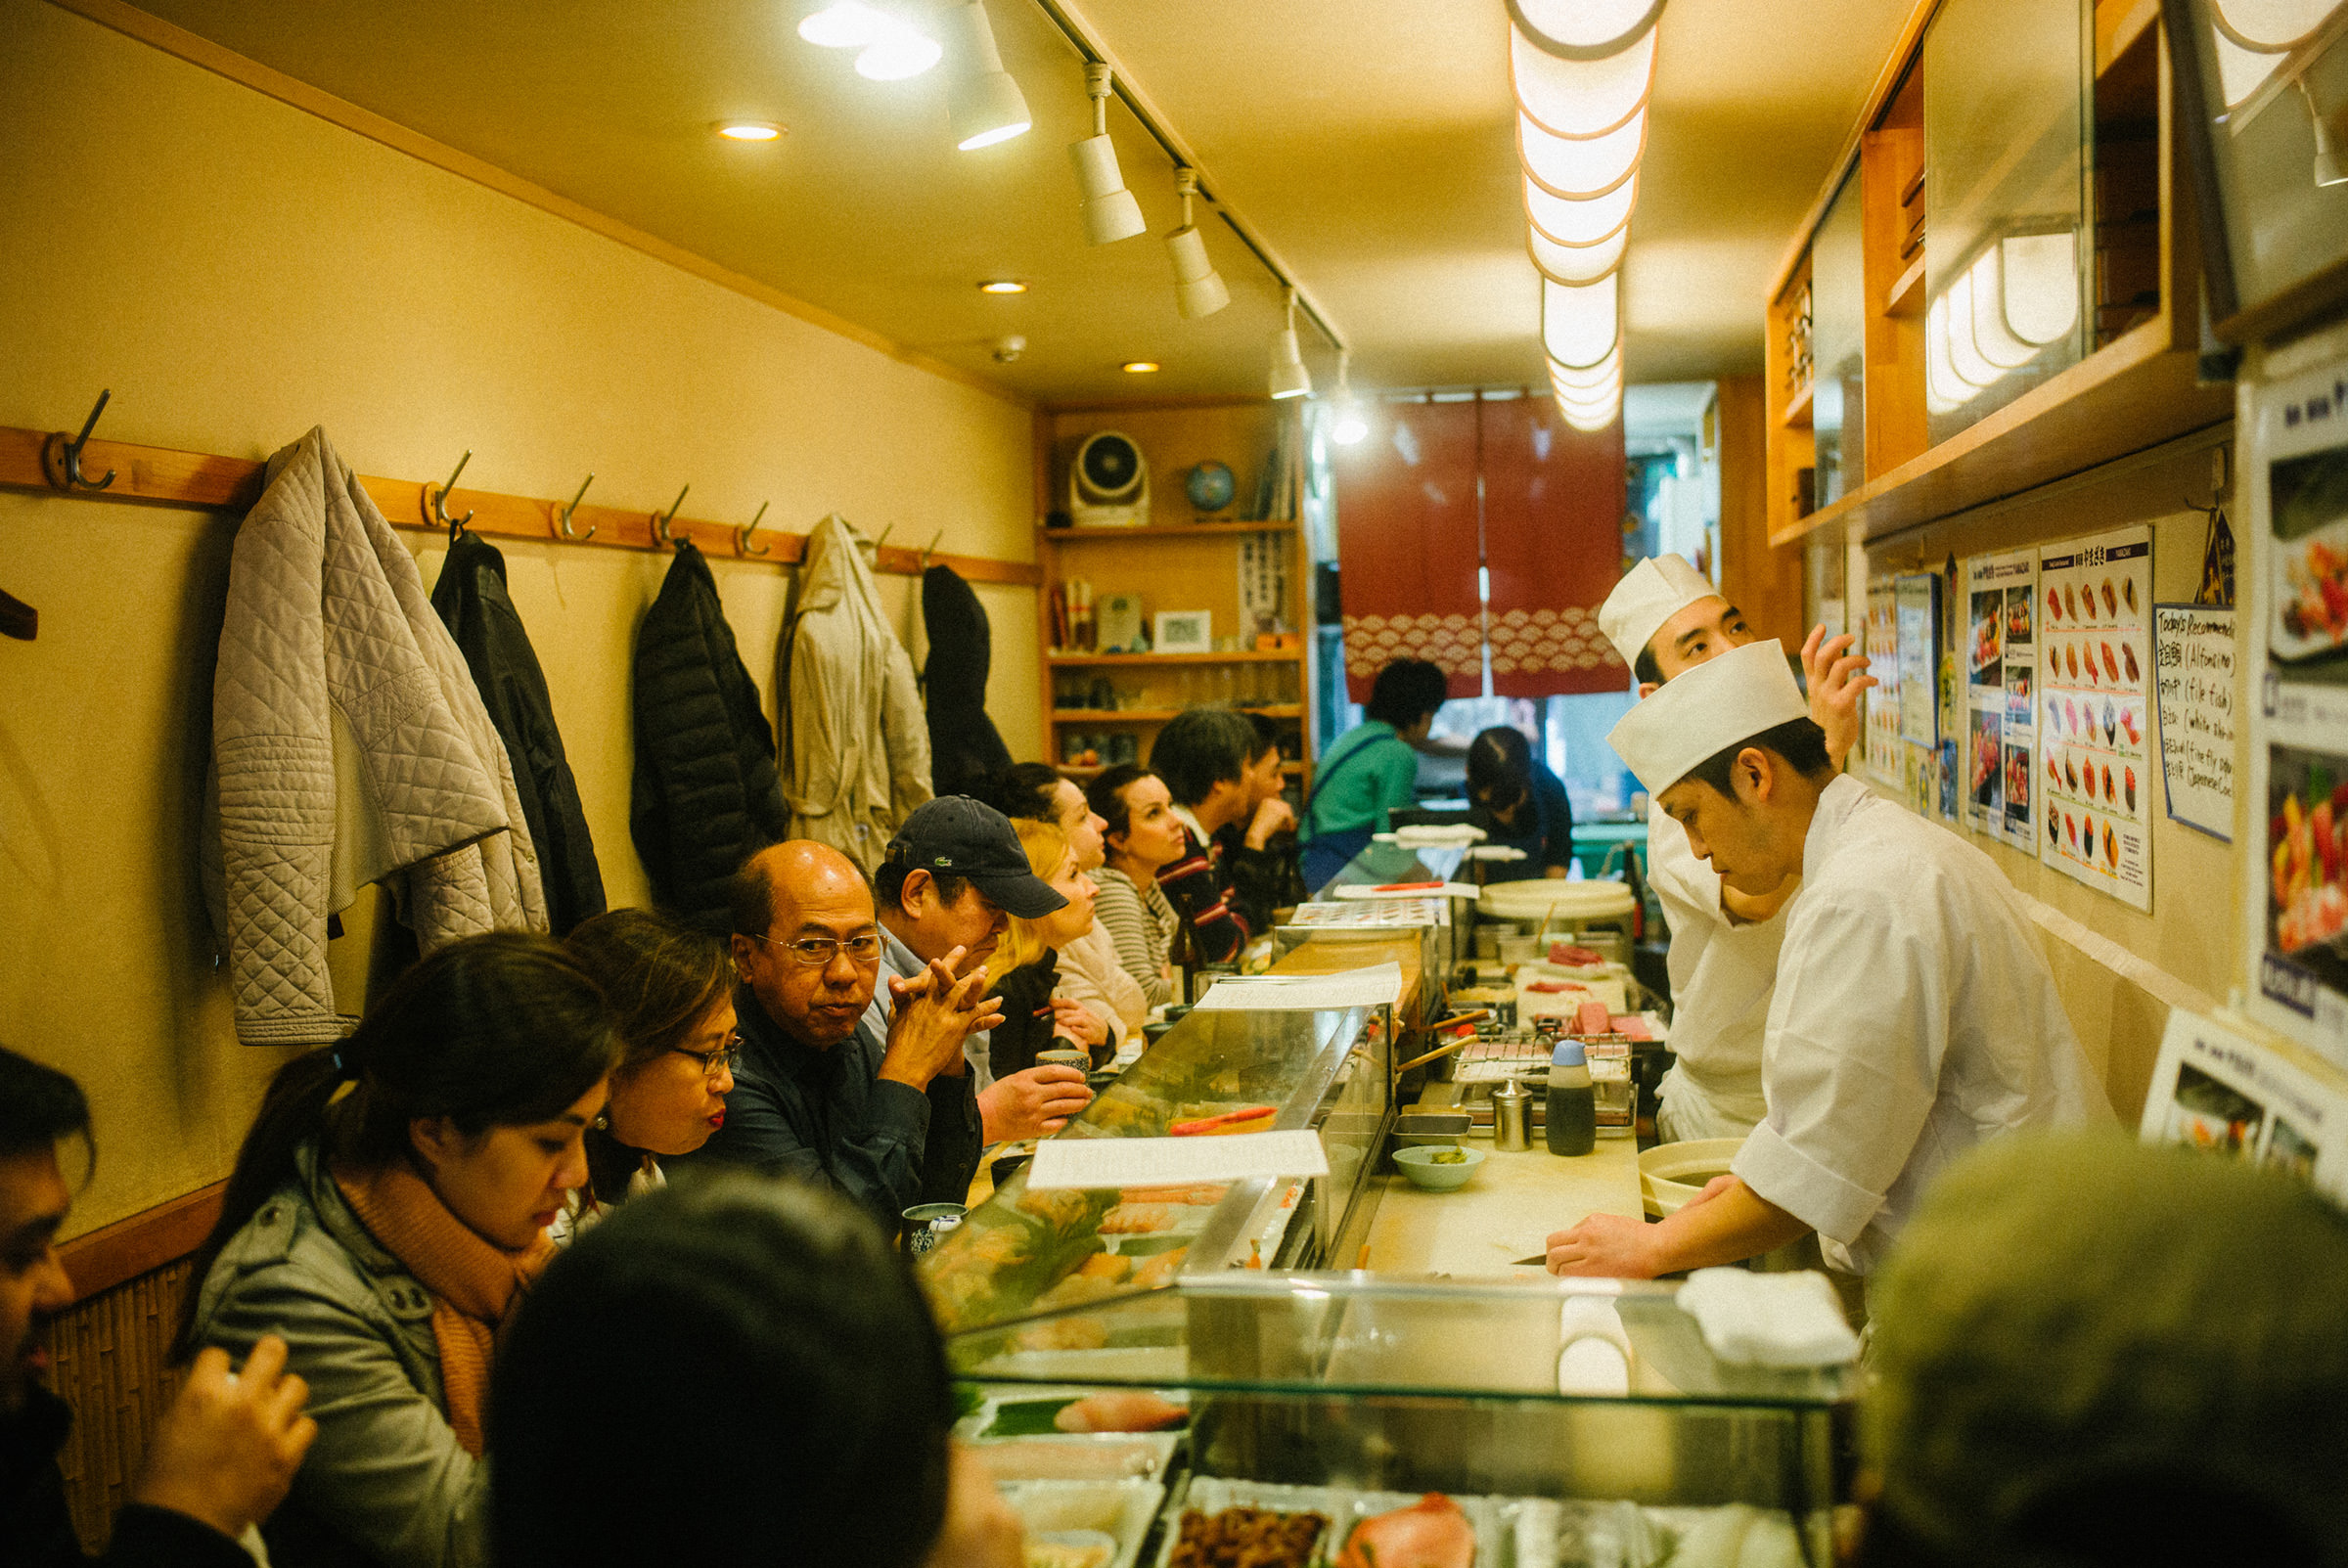 brandon_patoc_travel_japan_worldwide_photographer0024.jpg